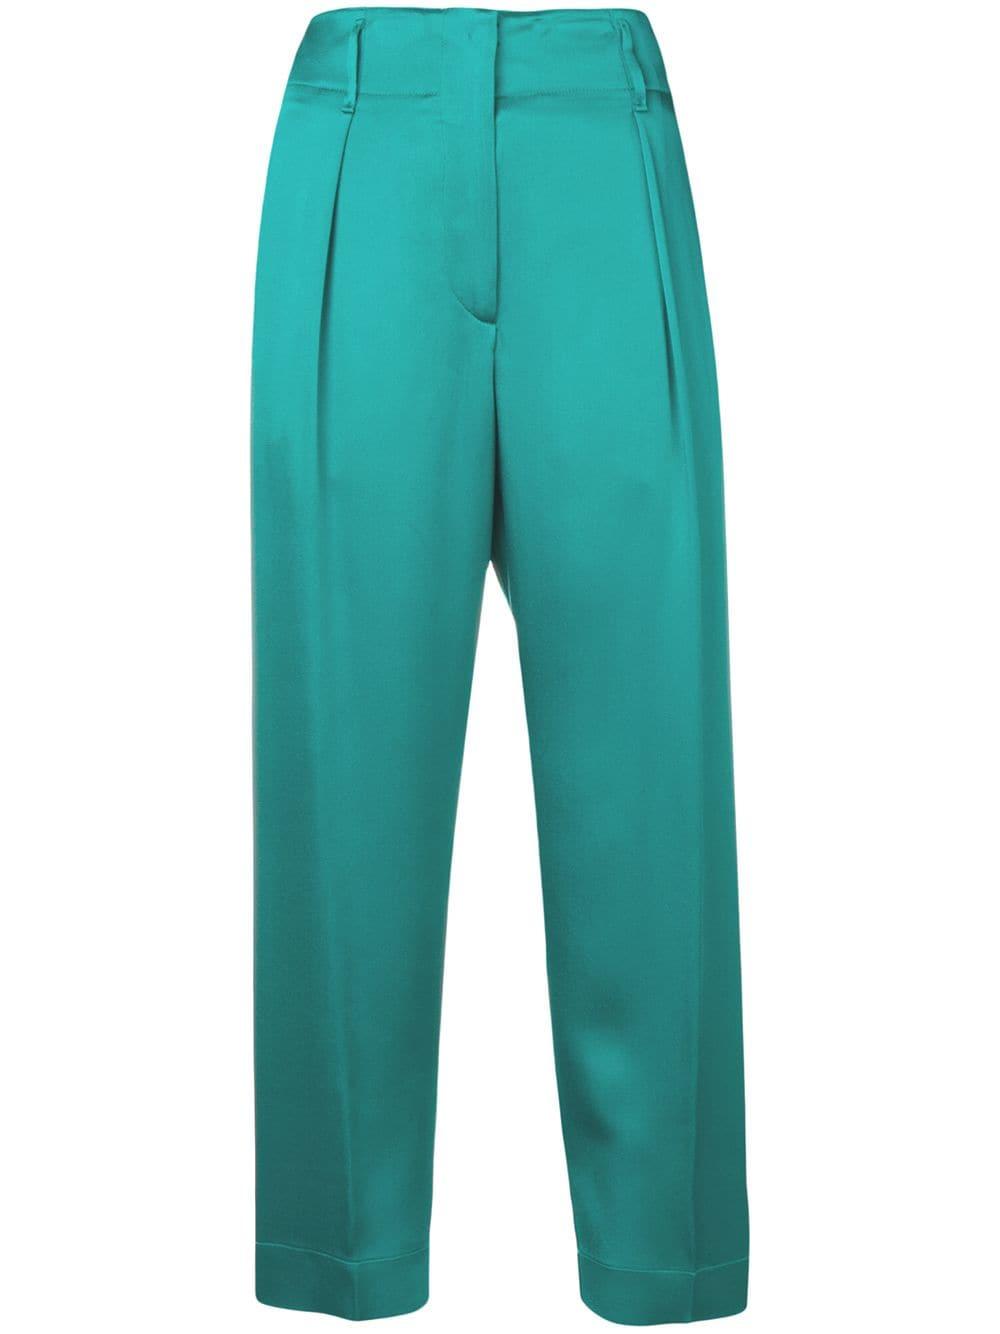 Pantaloni cropped in cotone blu pavone FORTE_FORTE   Pantaloni   6034PEACOCK